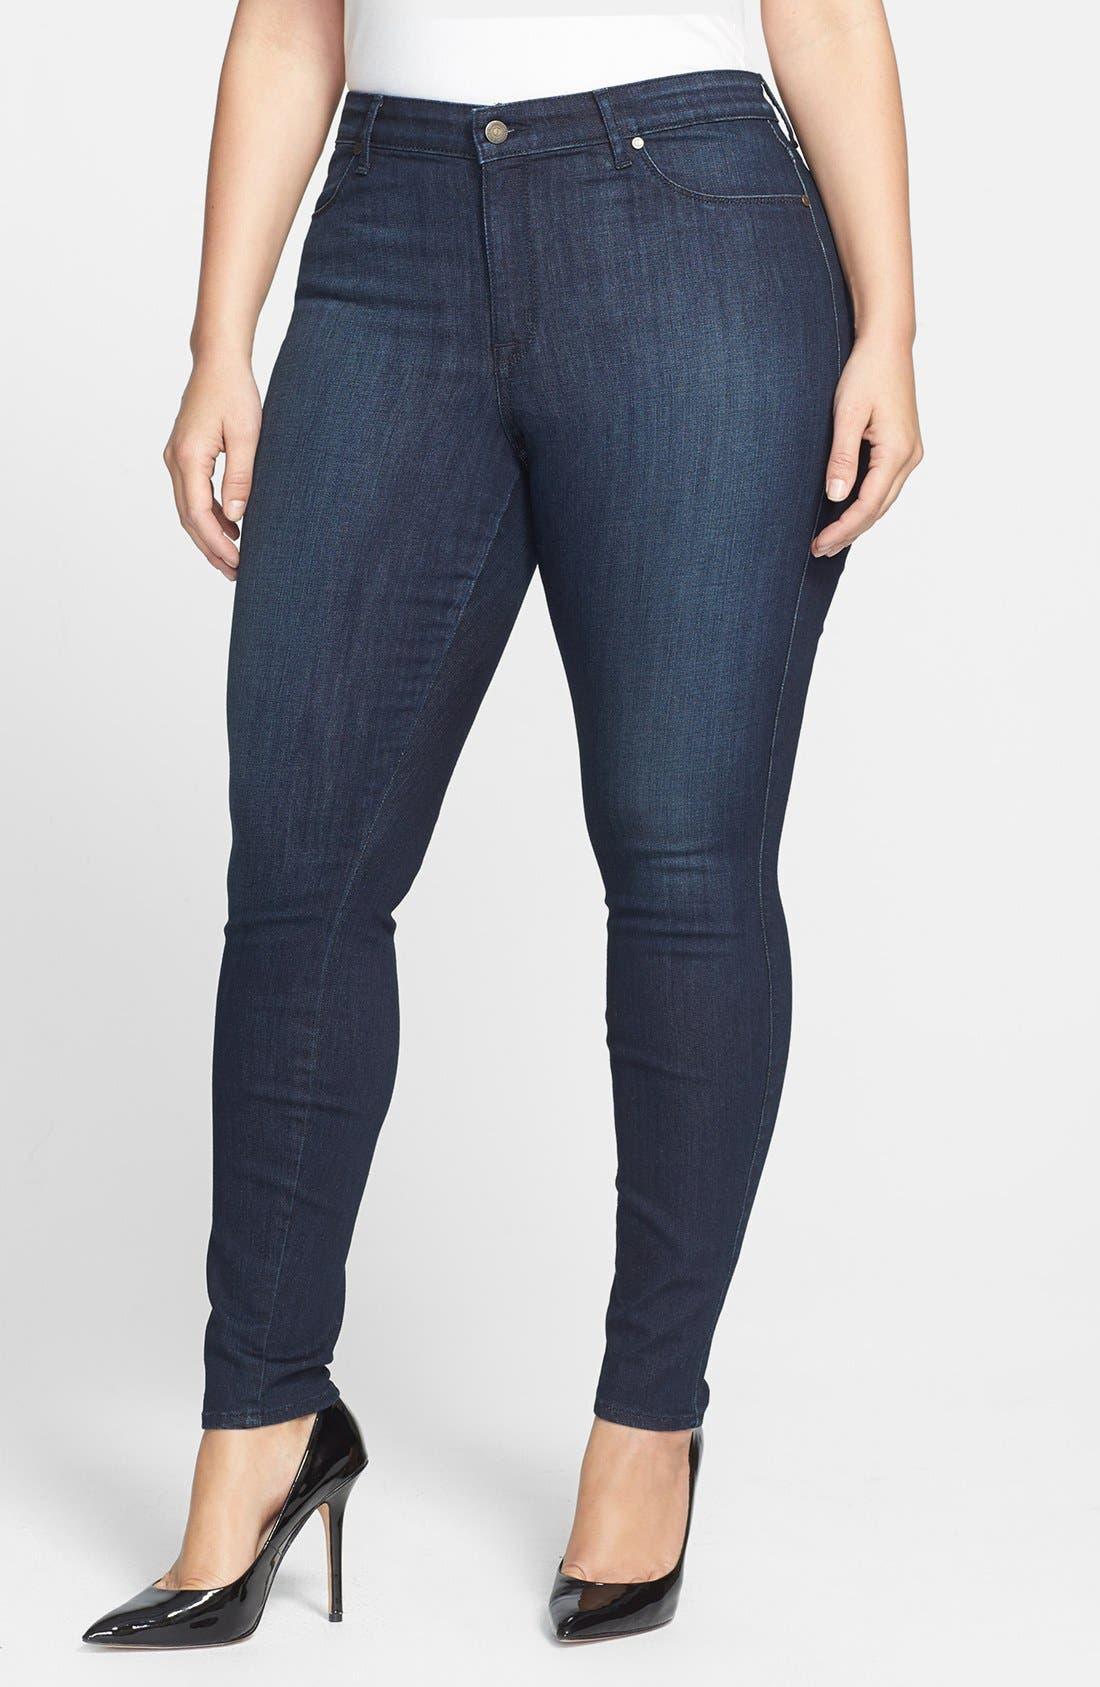 'Joy' Legging Style Stretch Jeans,                         Main,                         color, 400